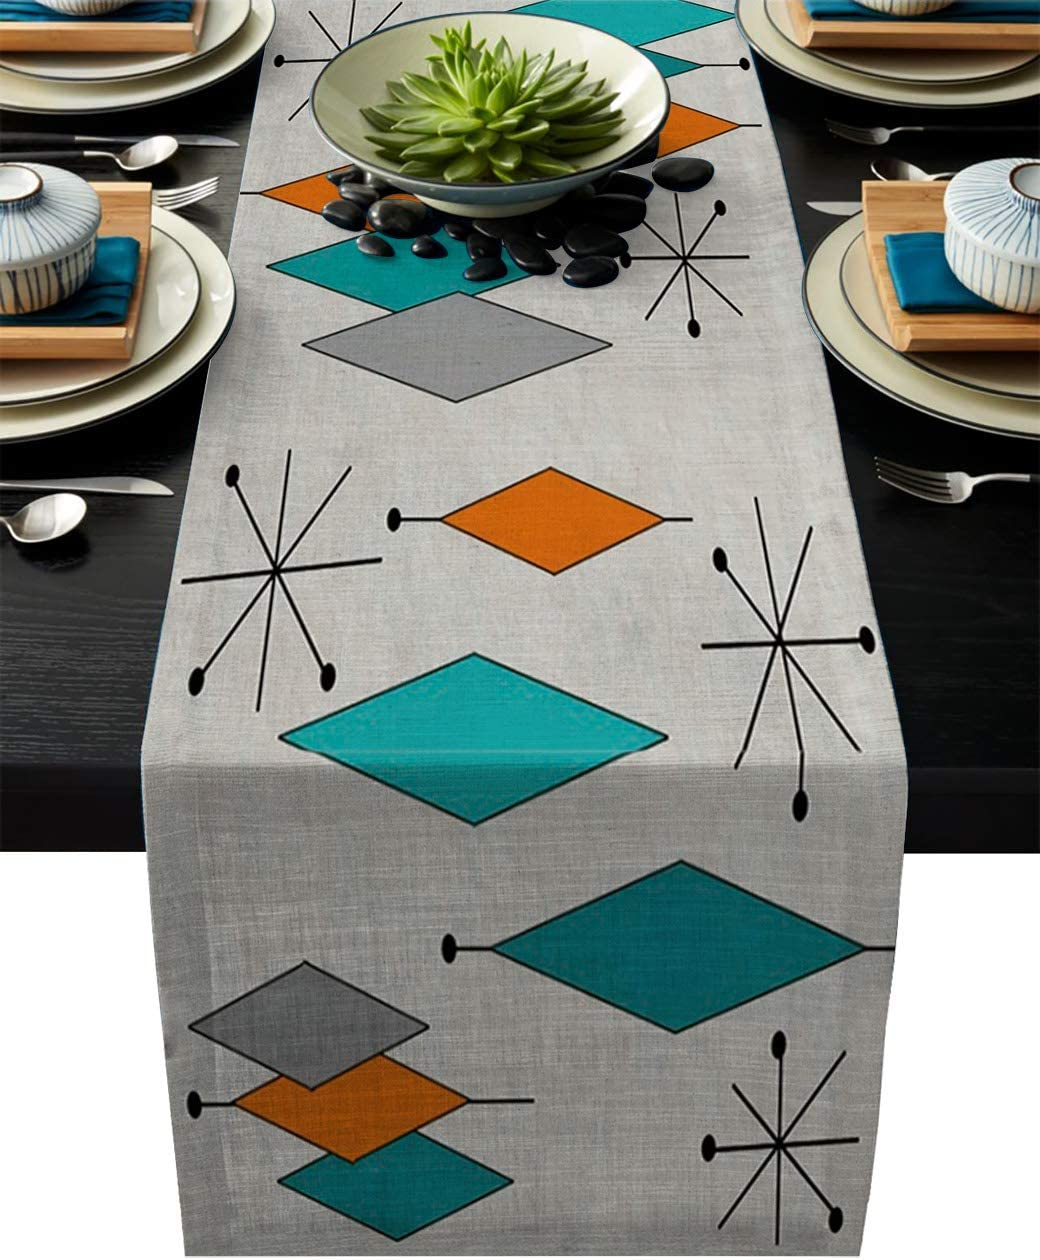 Vandarllin Cotton Linen Table Runner Dresser Scarves Retro Modern Mid Century Geometric Non-Slip Burlap Rectangle Table Setting Decor for Wedding Party Holiday Dinner Home (14X72 Inch)